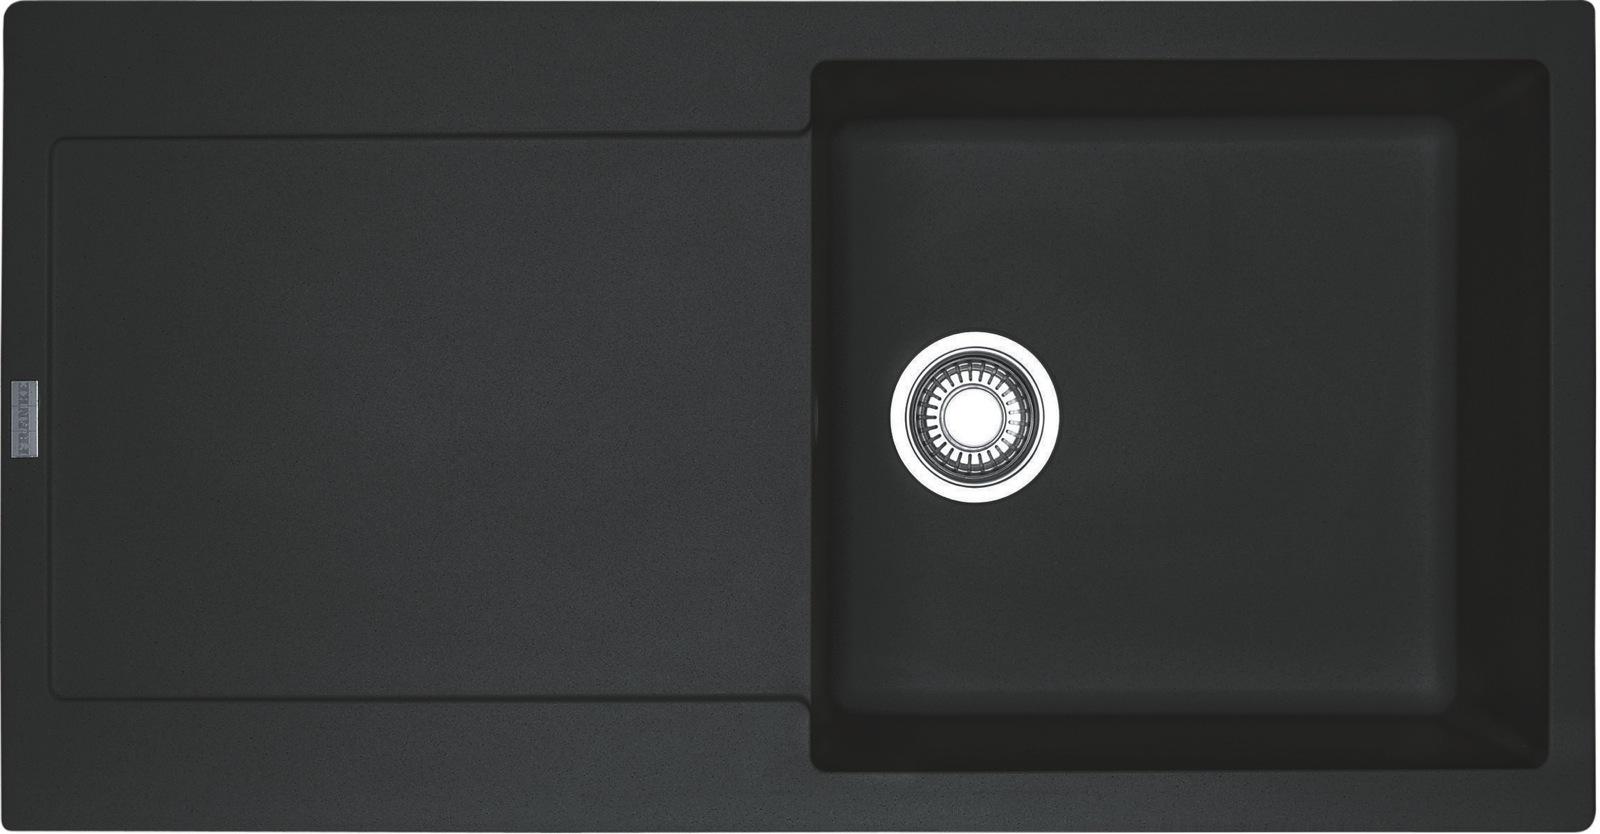 Chiuveta bucatarie fragranite Franke Maris MRG 611-L reversibila 970x500mm tehnologie Sanitized Nero imagine sensodays.ro